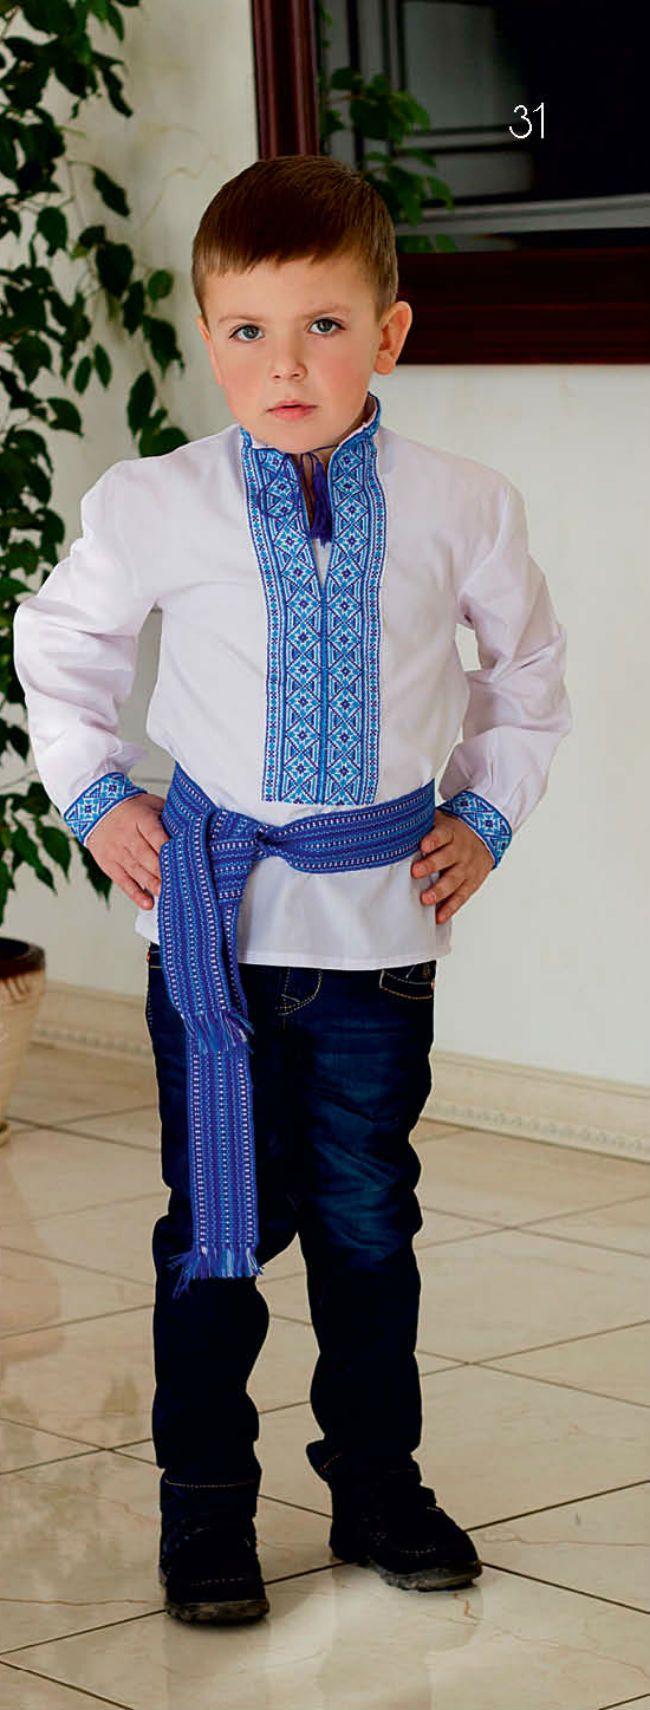 ef9cdf6911acab Вишиванка дитяча для хлопчика, вишита сорочка схема Золота колекція  української вишивки